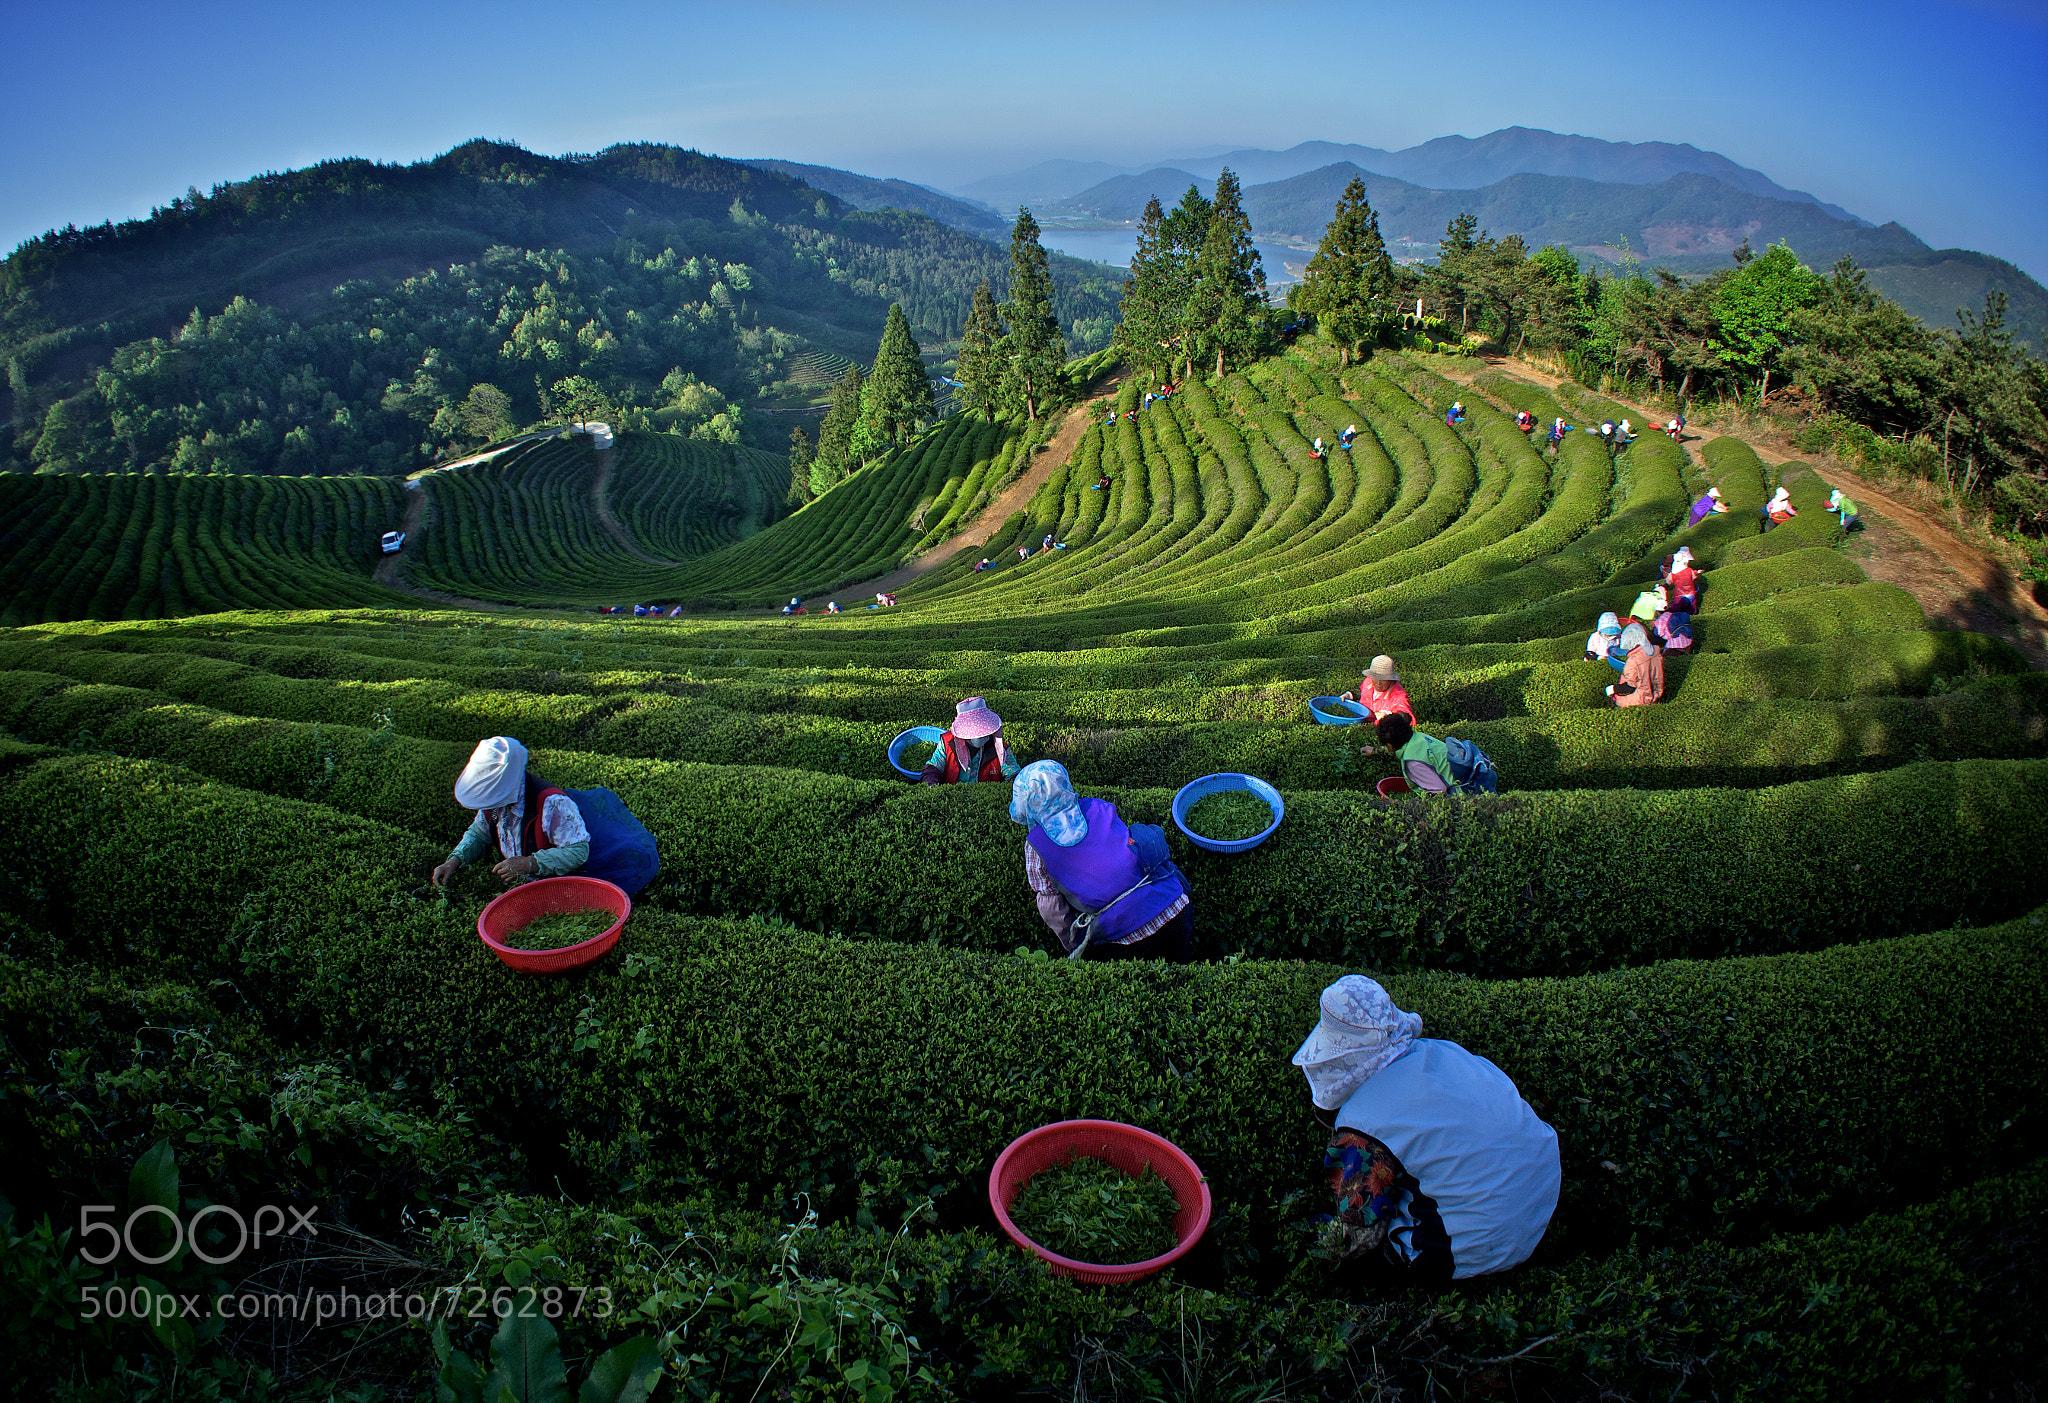 Photograph GreenTea Field in Korea by Jeong-Keun Kim on 500px